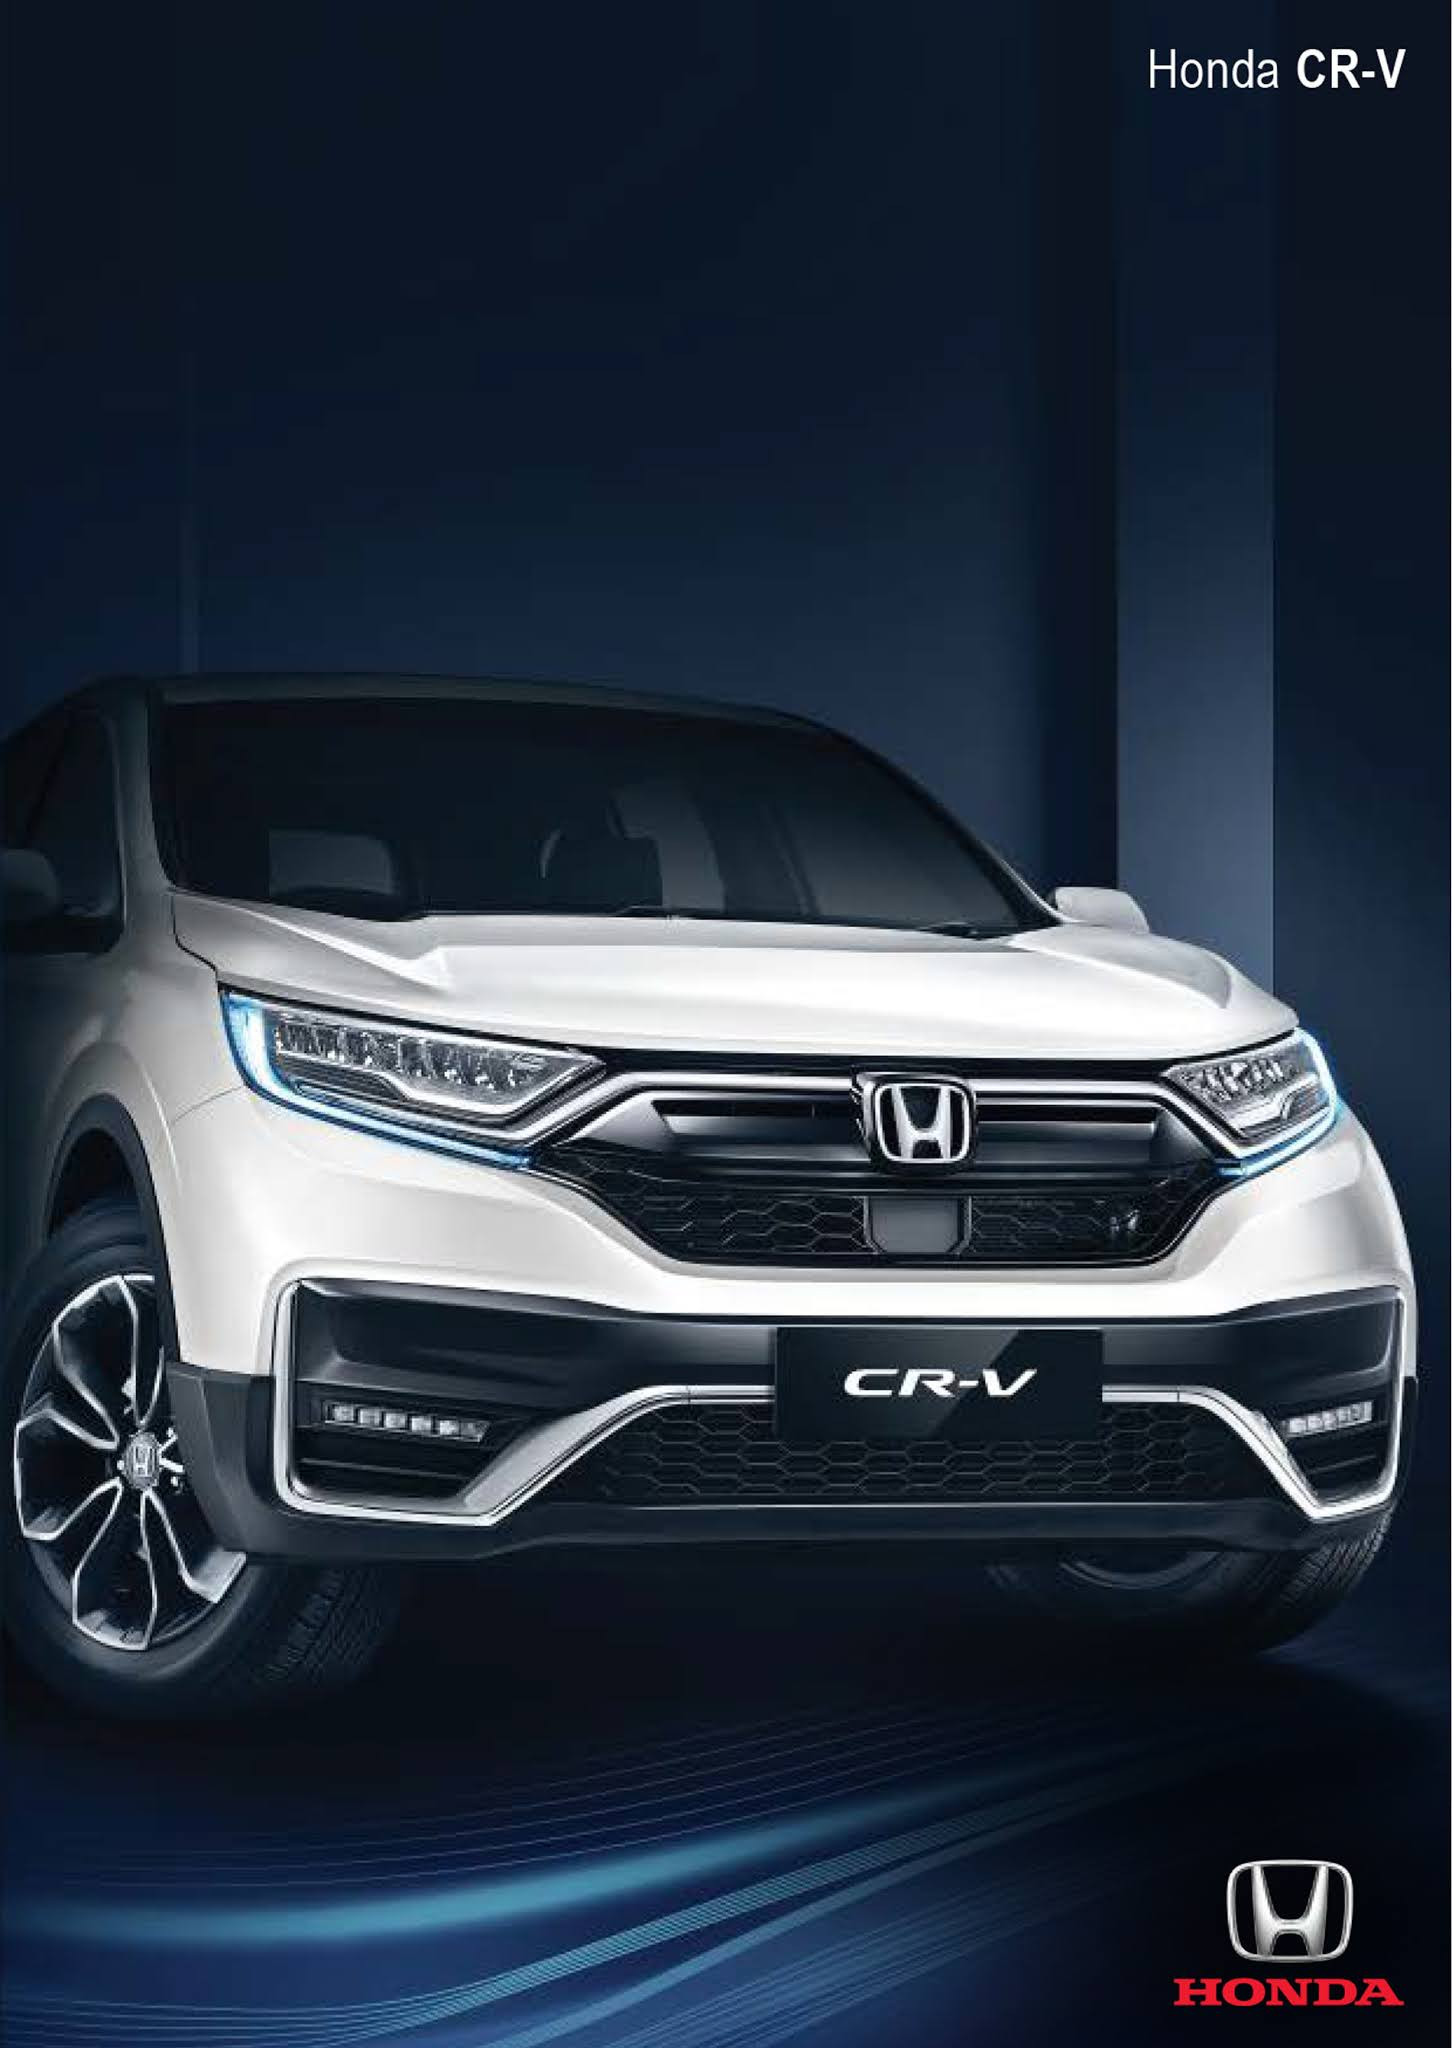 Harga Honda CRV Pekanbaru Riau Terbaru bulan ini 2021